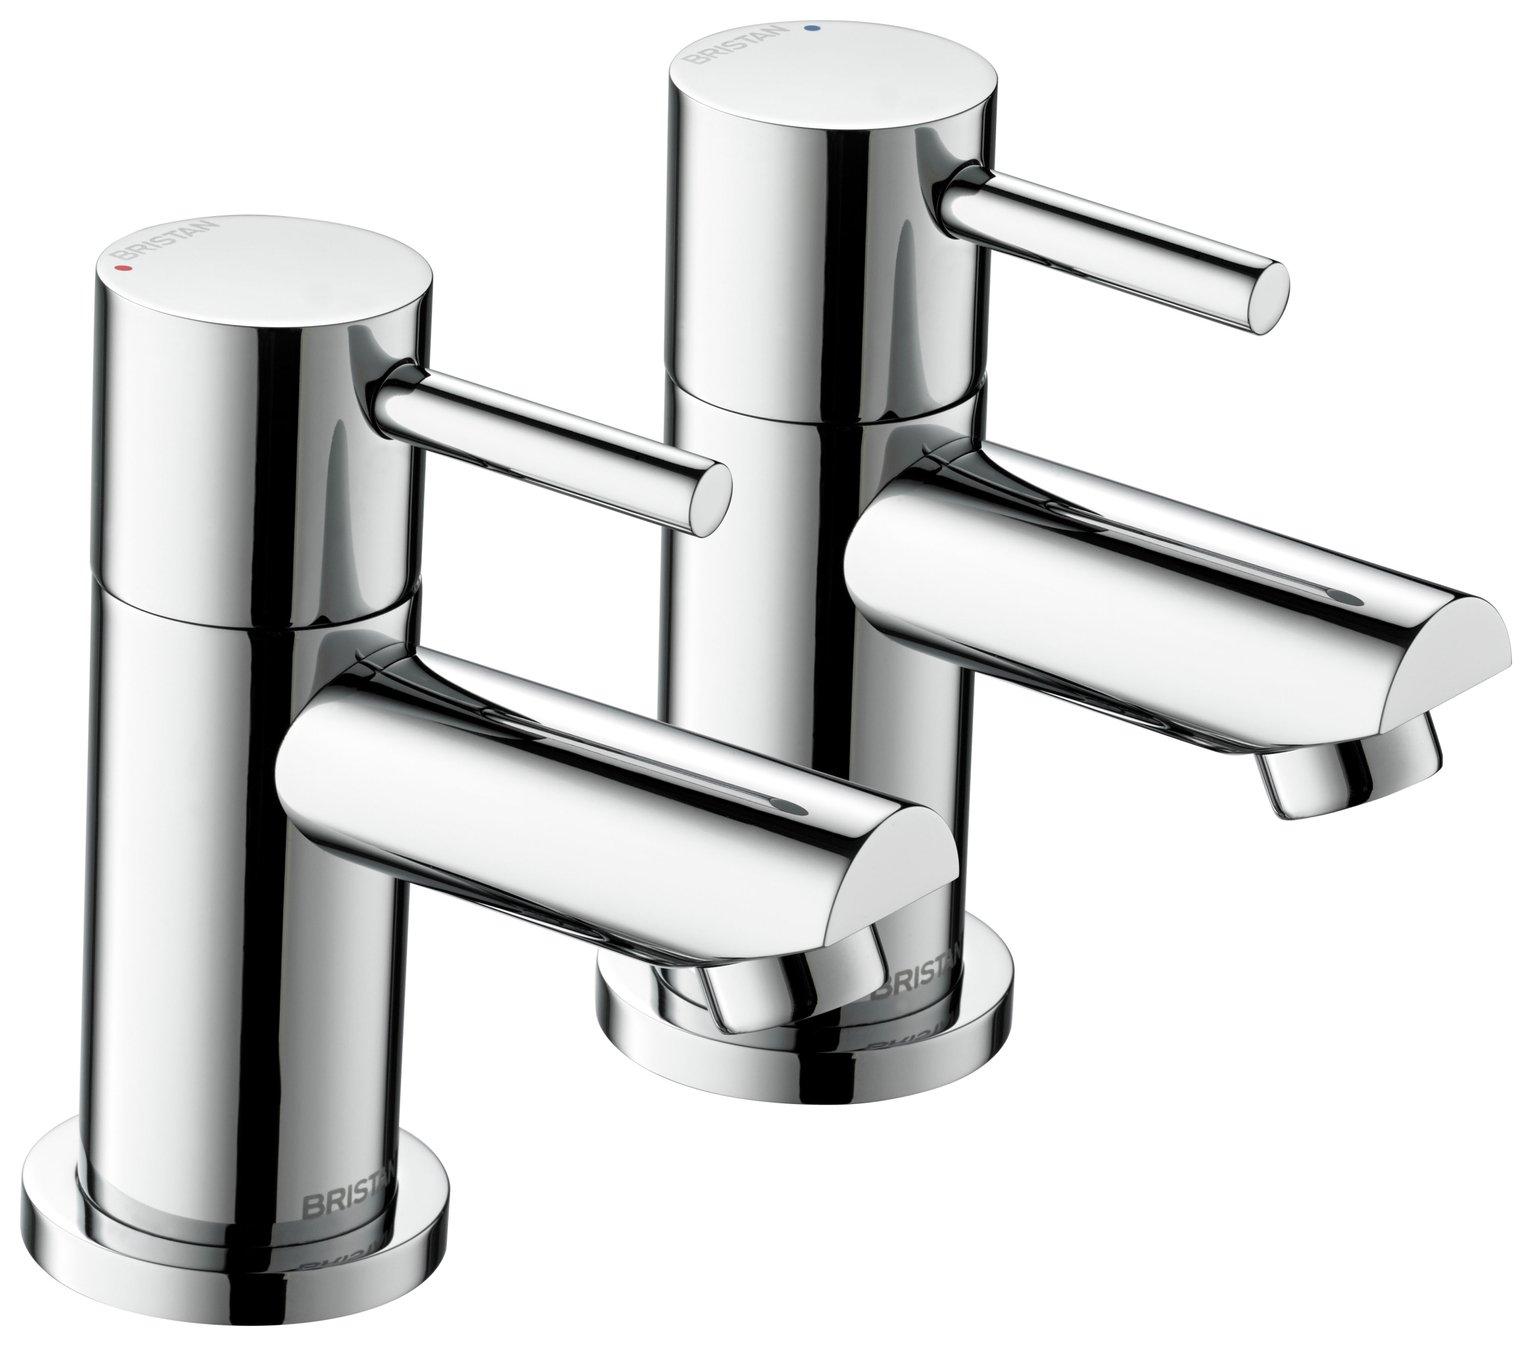 Bristan Blitz Bath Taps - Chrome